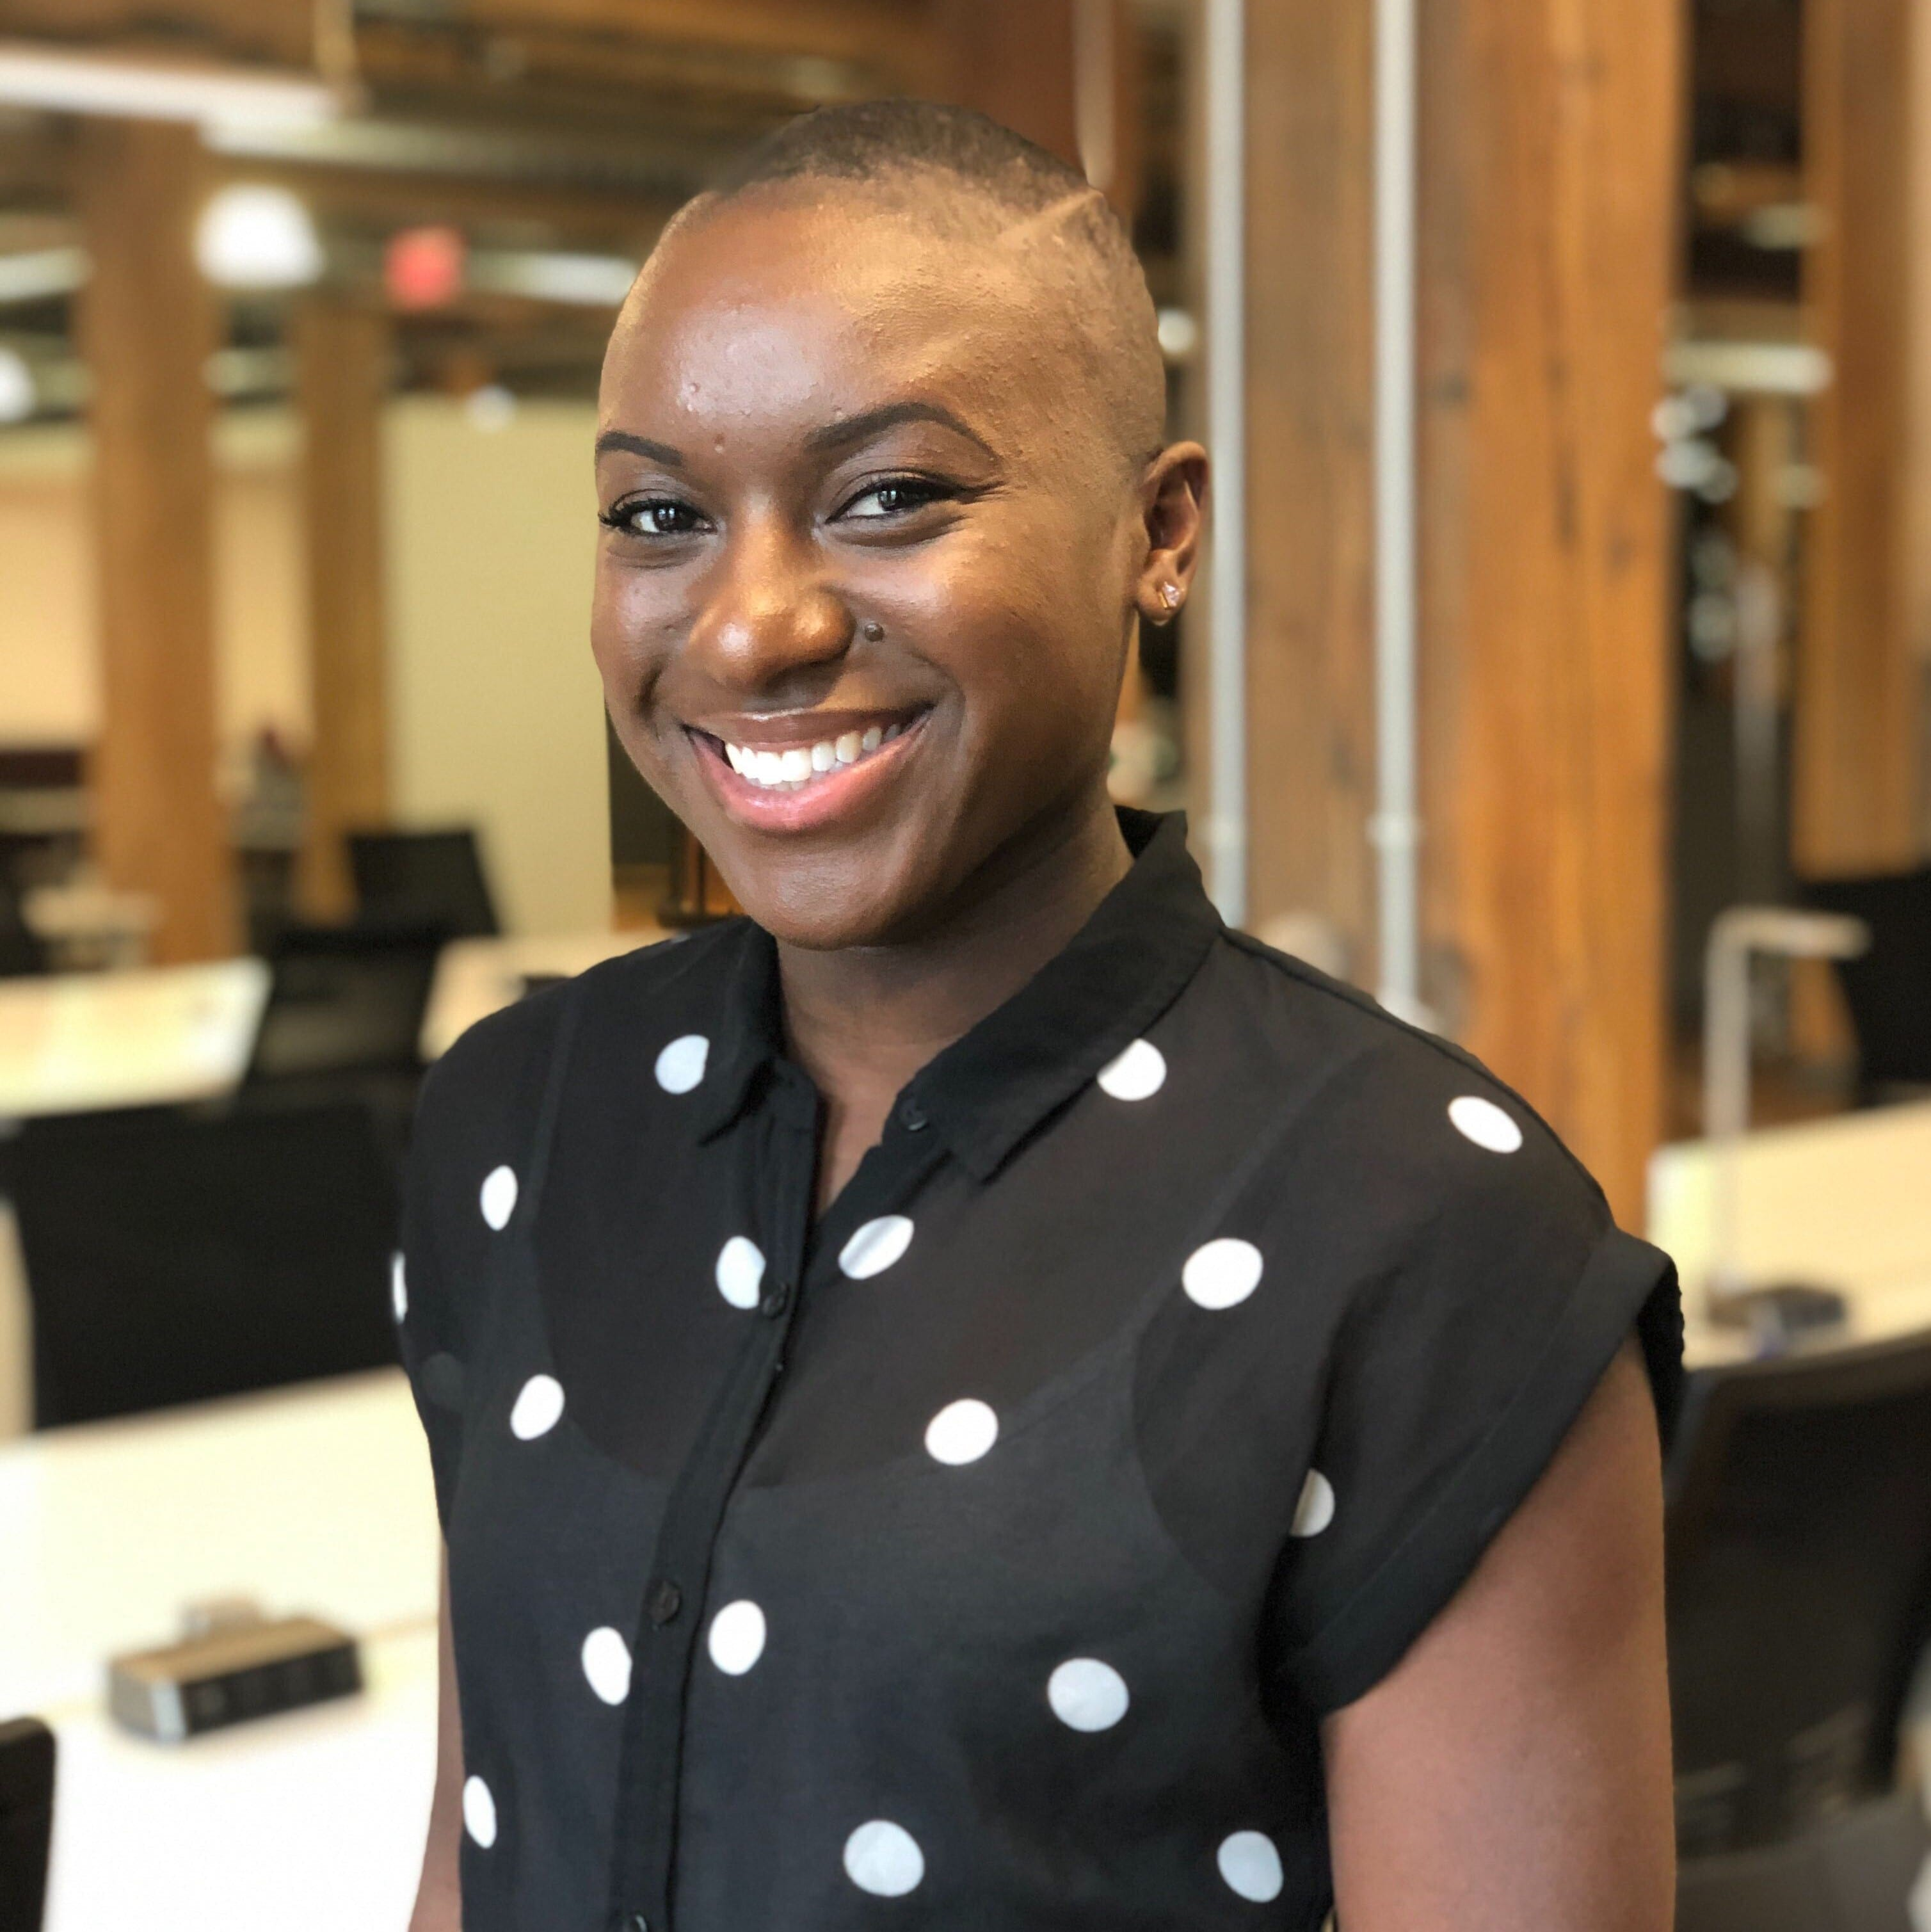 devCodeCamp Alumni Fatima Konteh